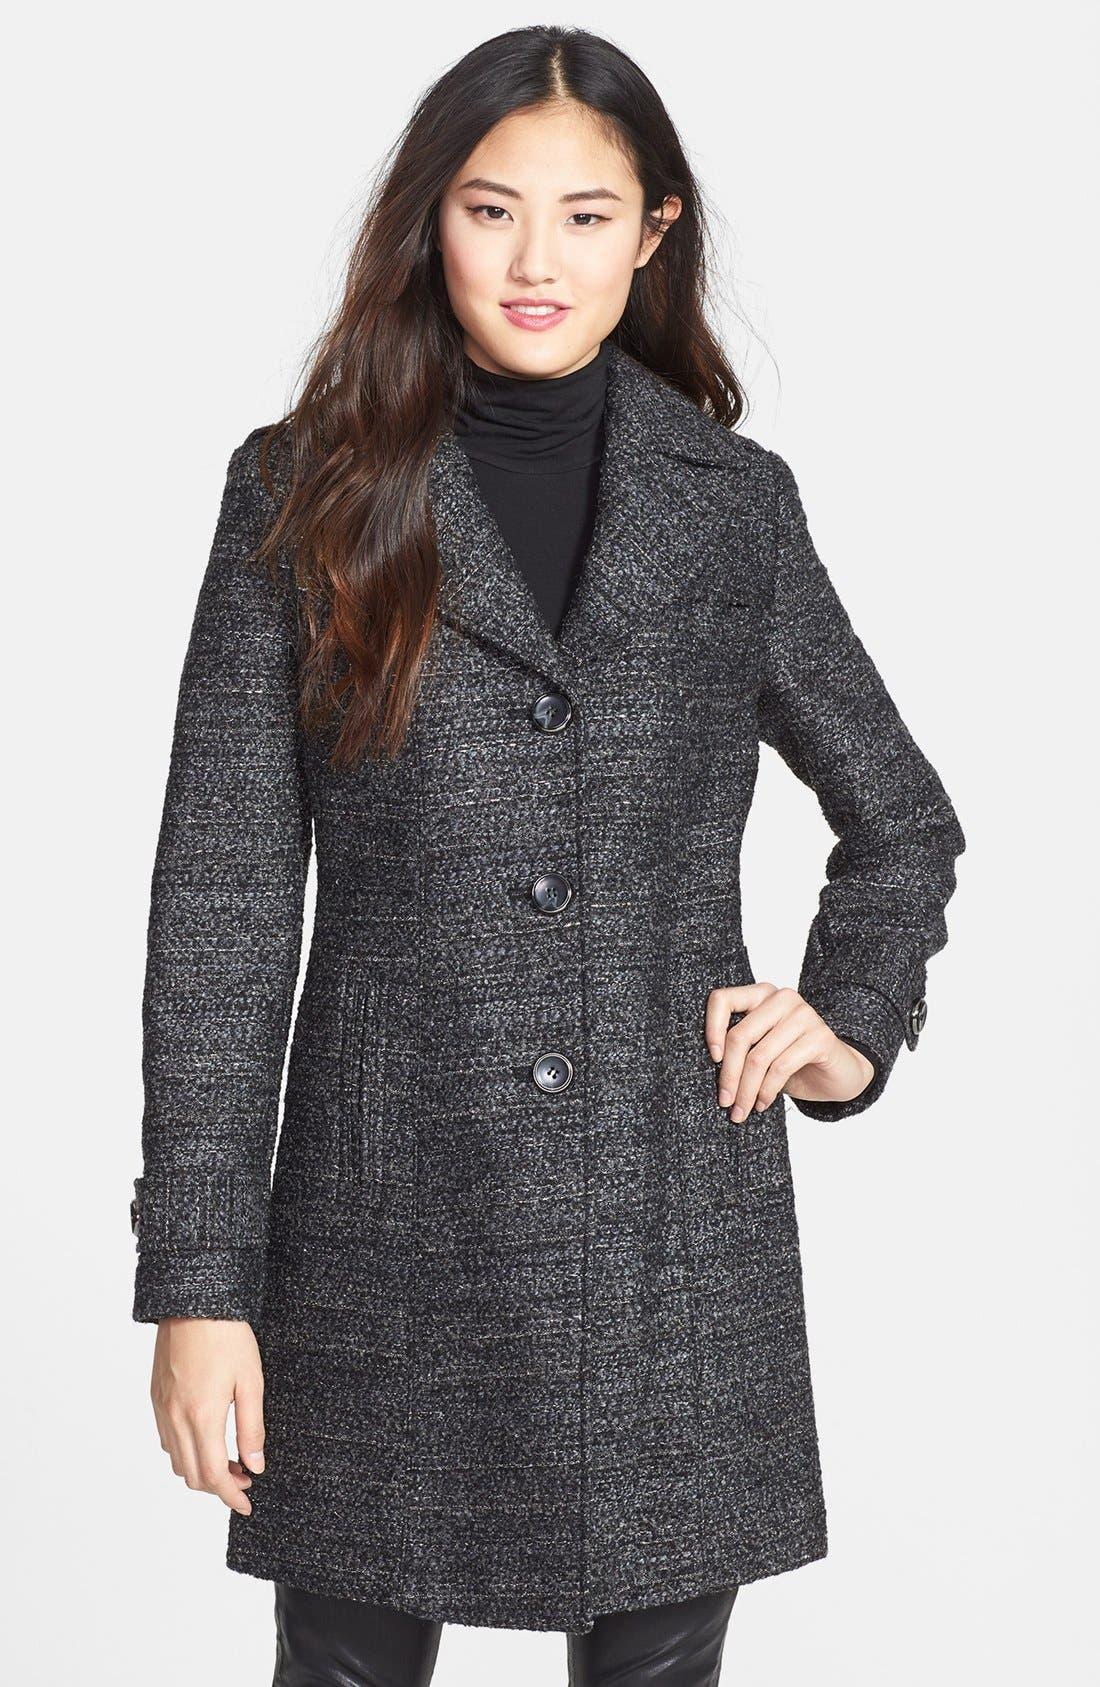 Metallic Tweed Walking Coat,                         Main,                         color,